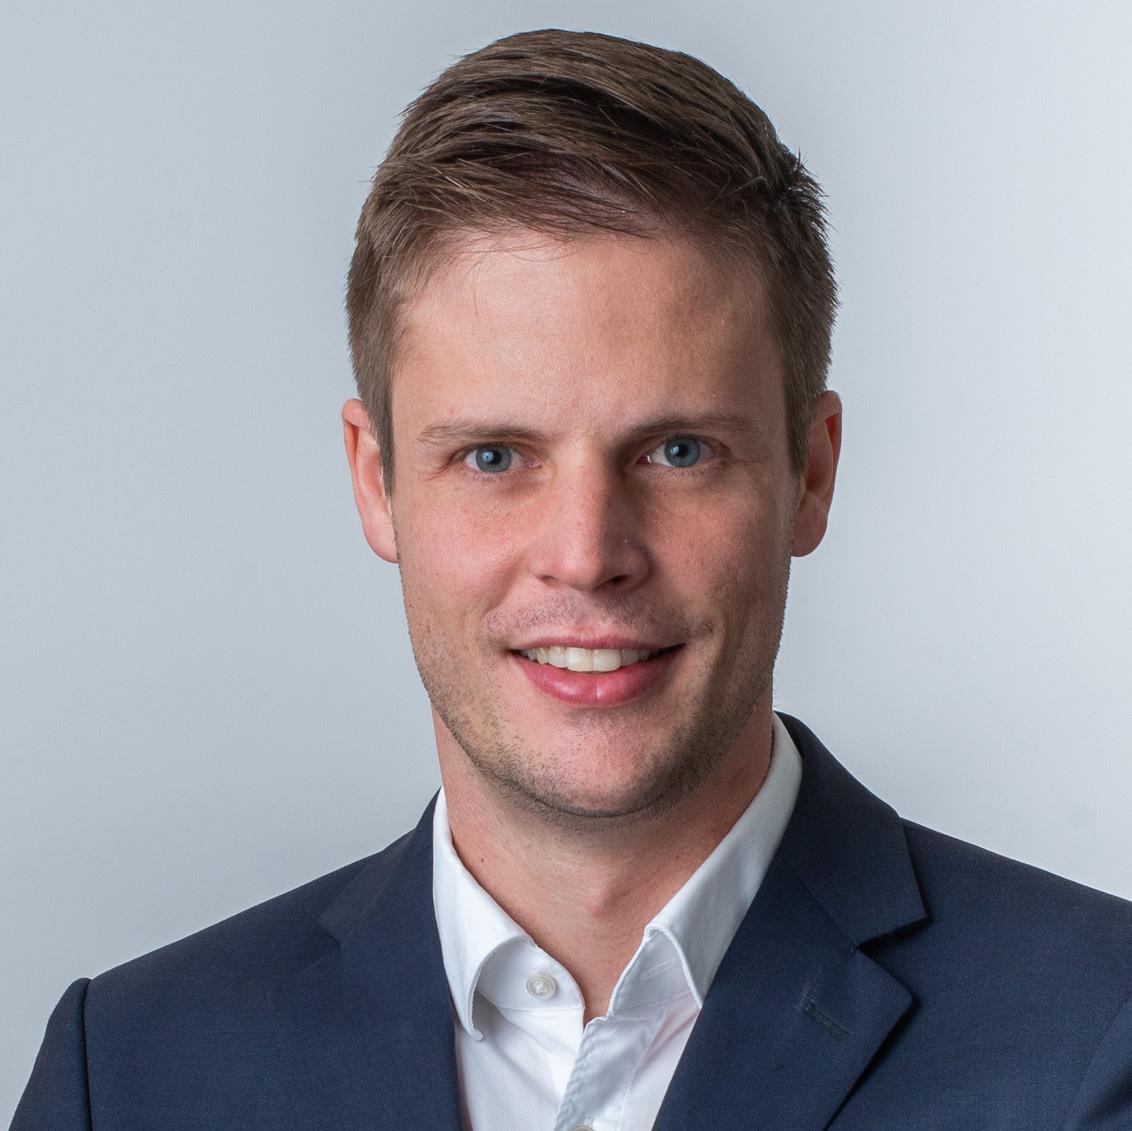 Marcel Brechbühl